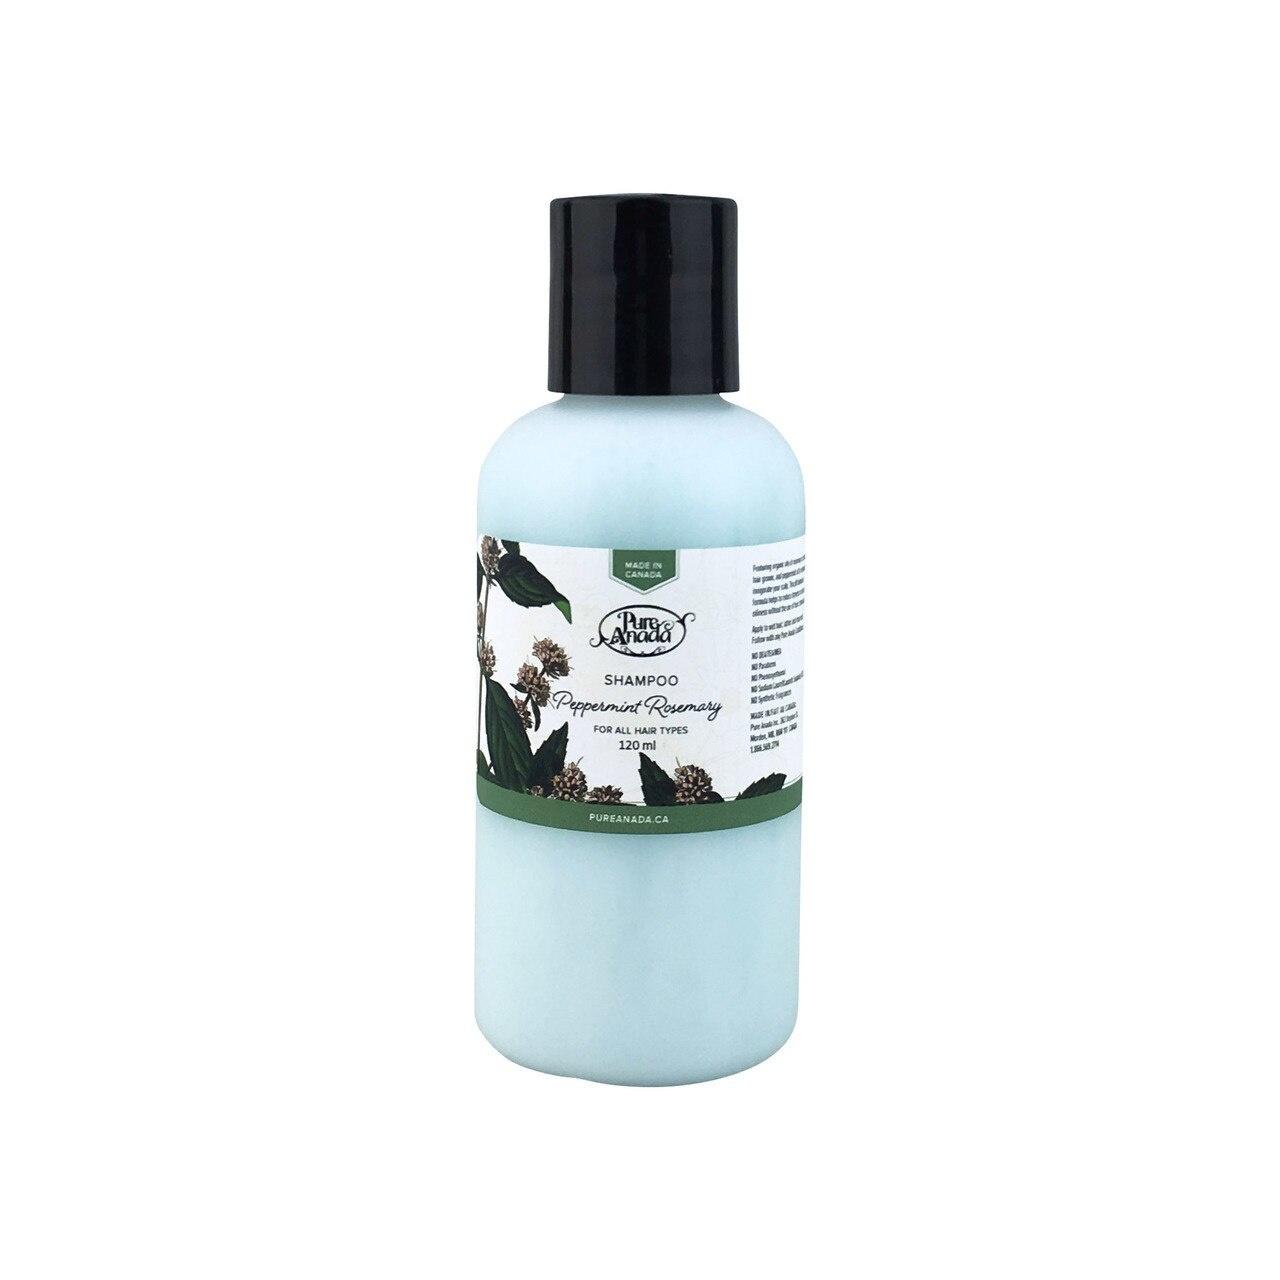 Shampoo - Peppermint Rosemary-2